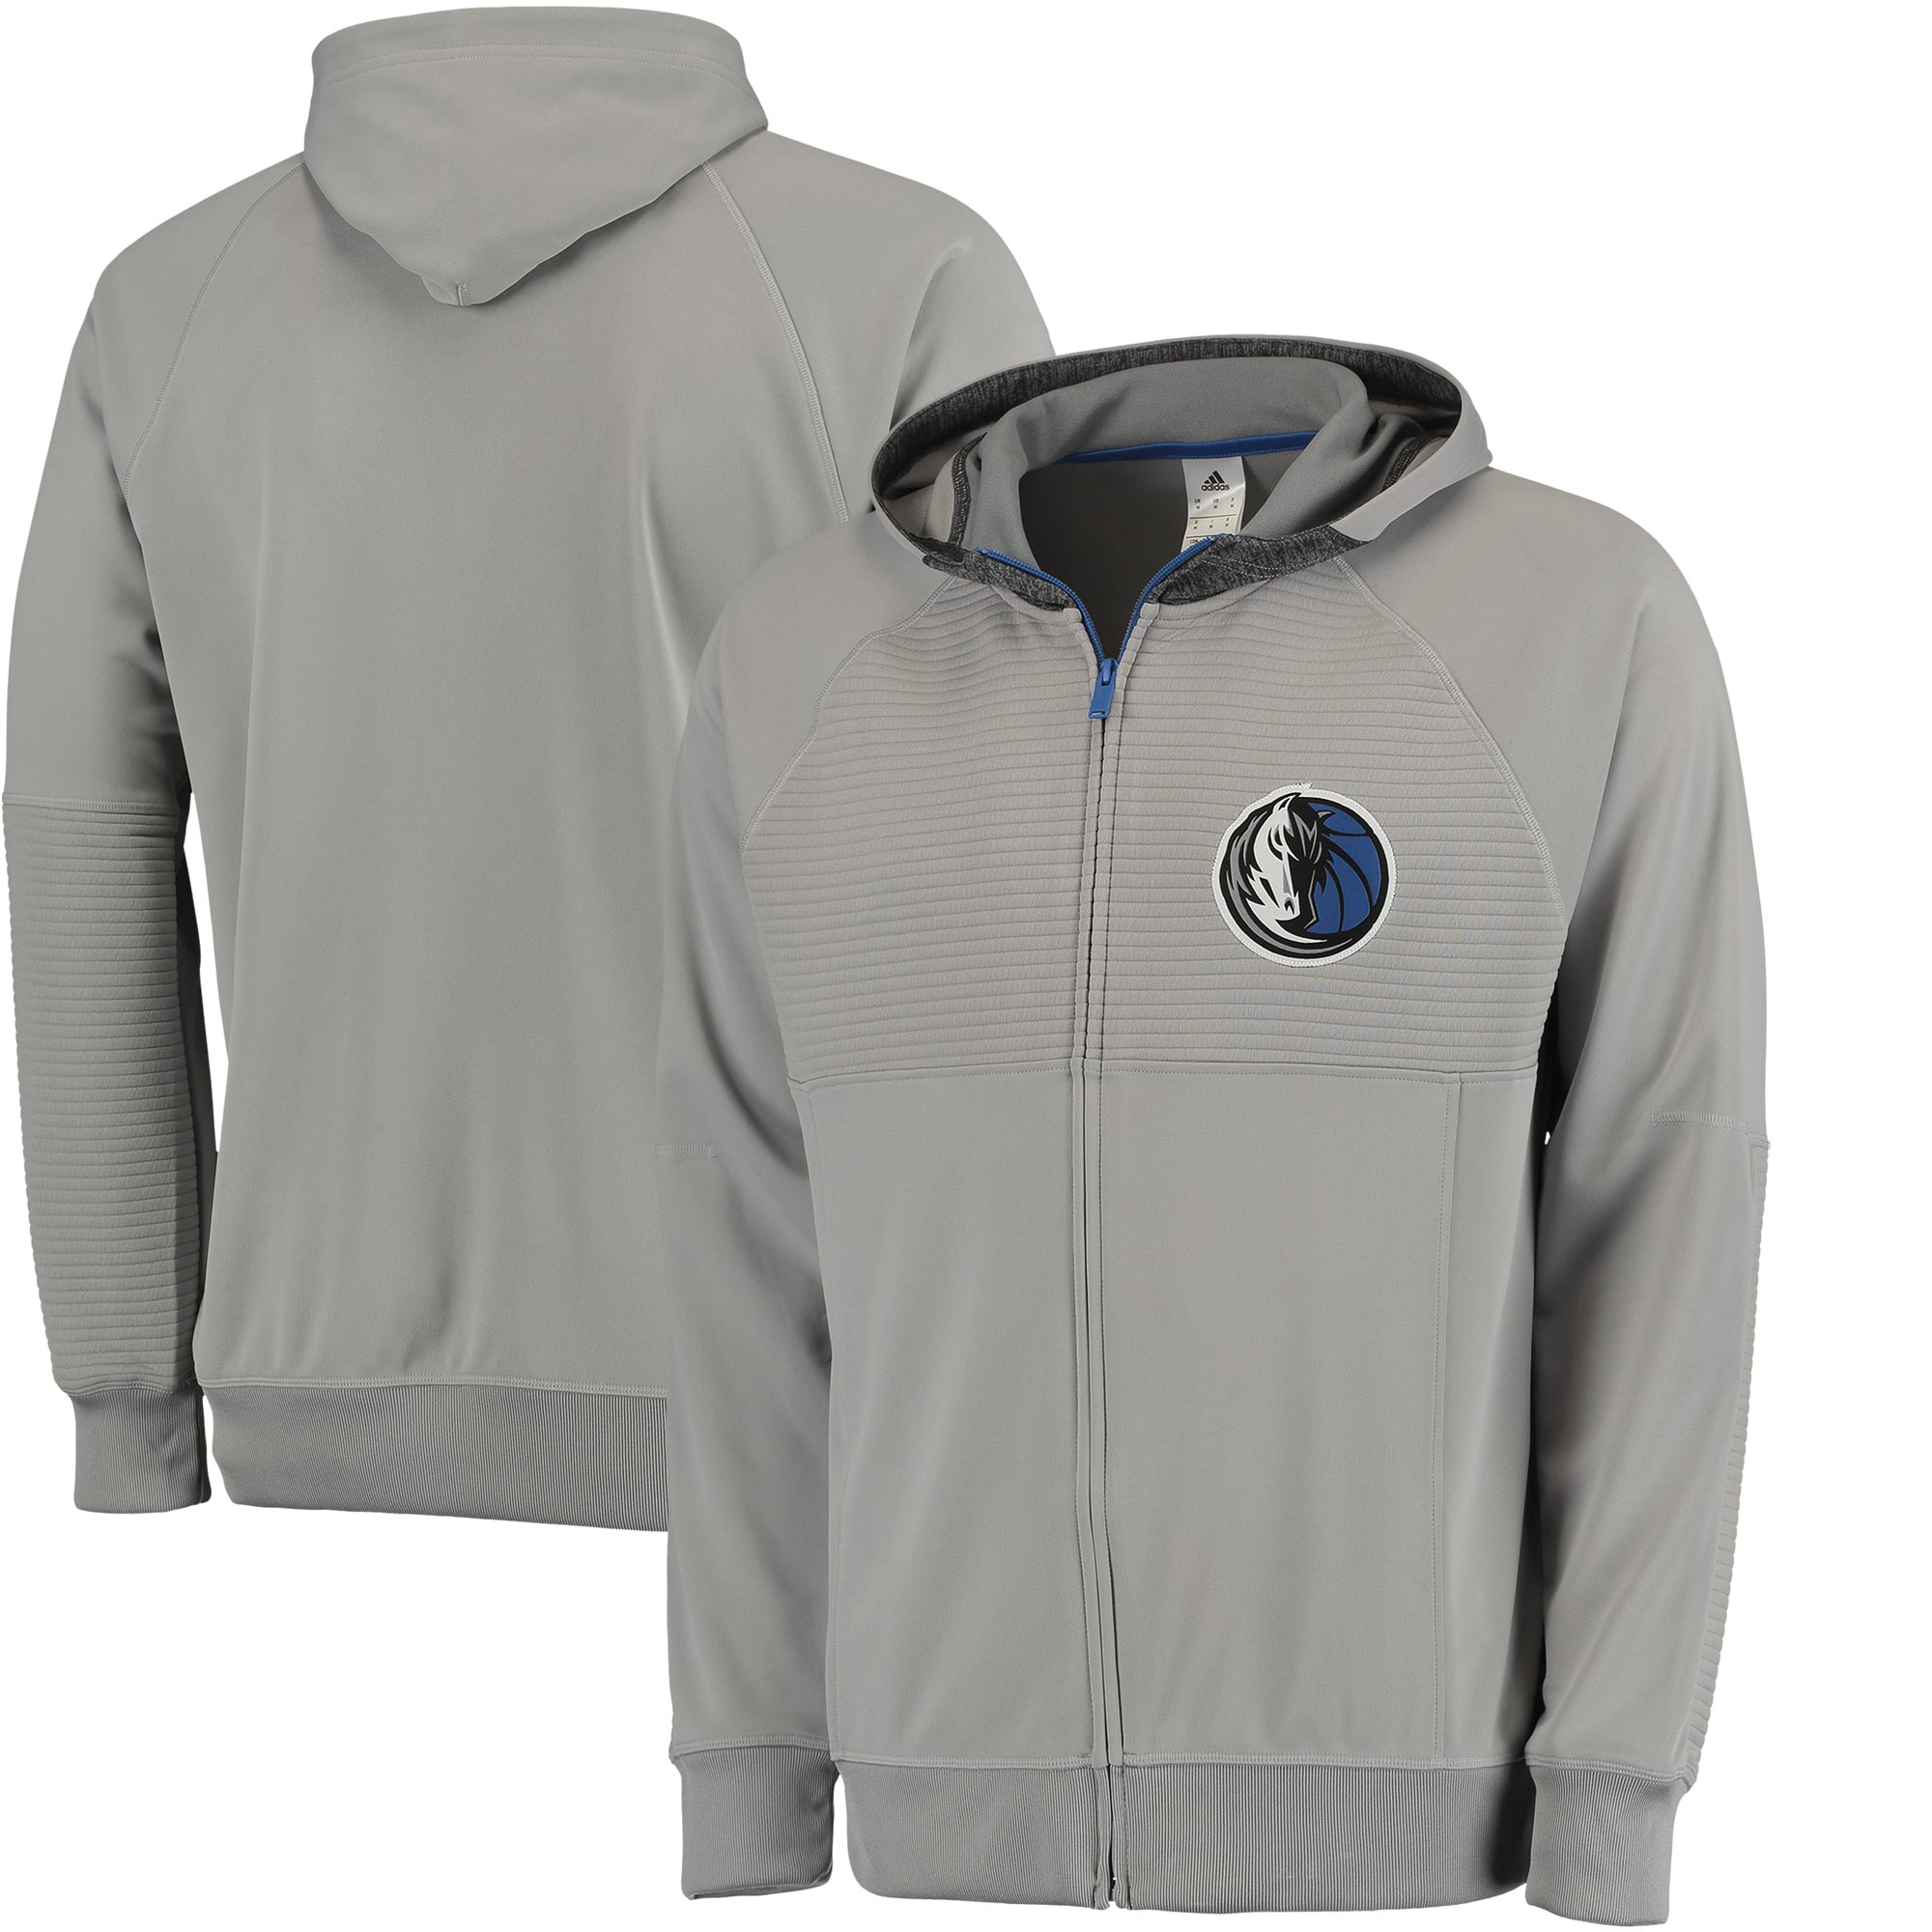 Dallas Mavericks adidas 2016 Pre-Game Full-Zip Hooded Jacket - Gray